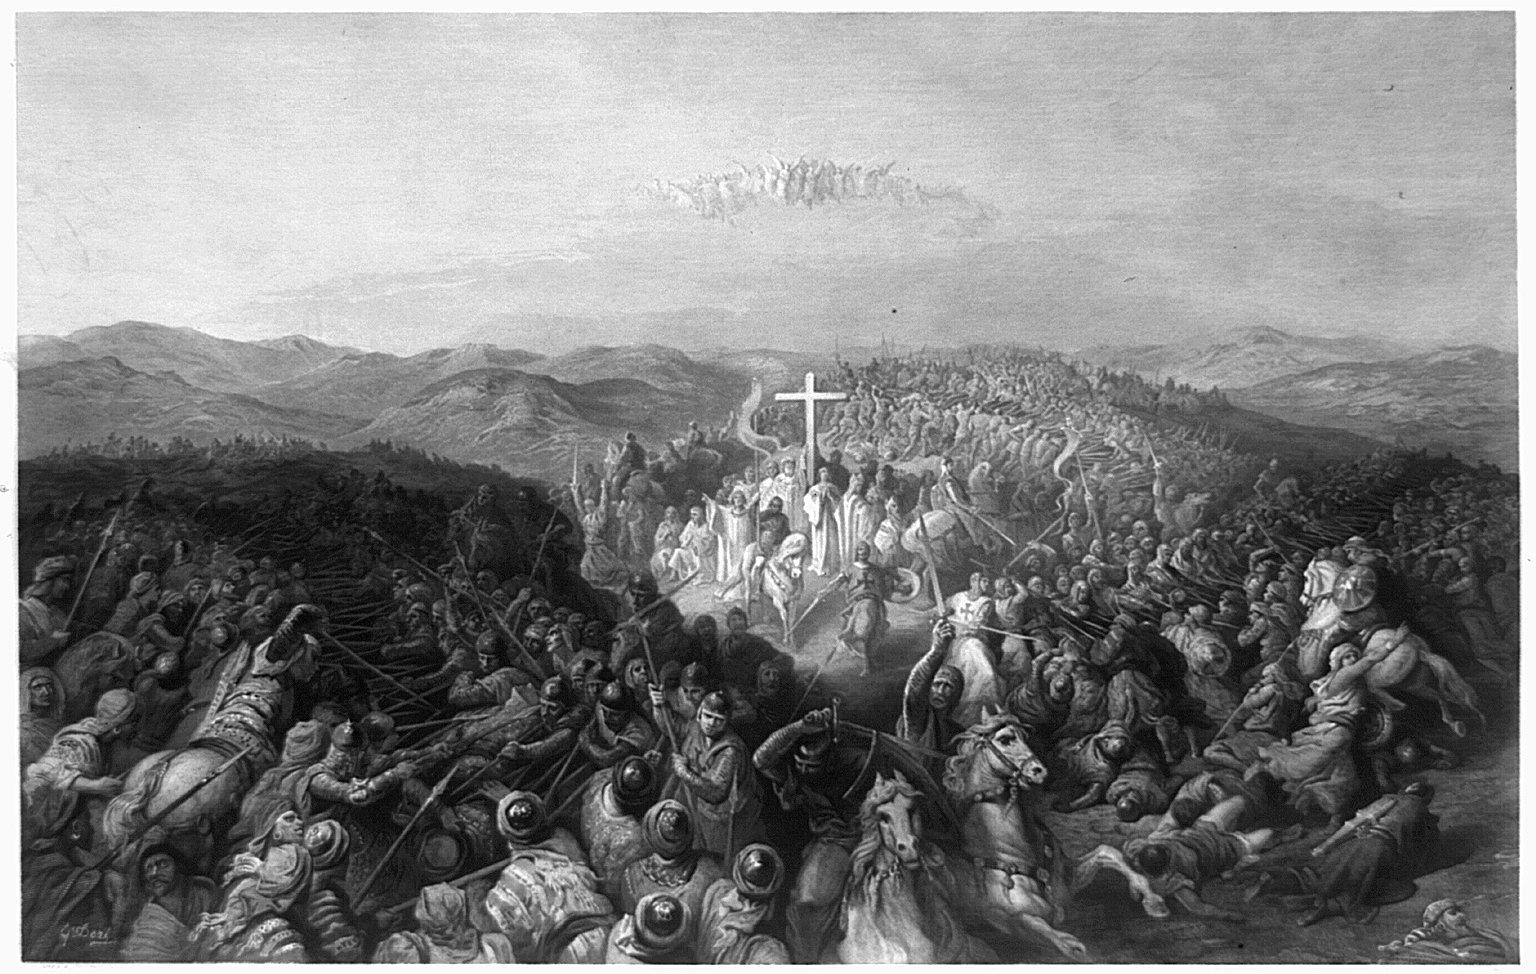 Battle of Ascalon engraving